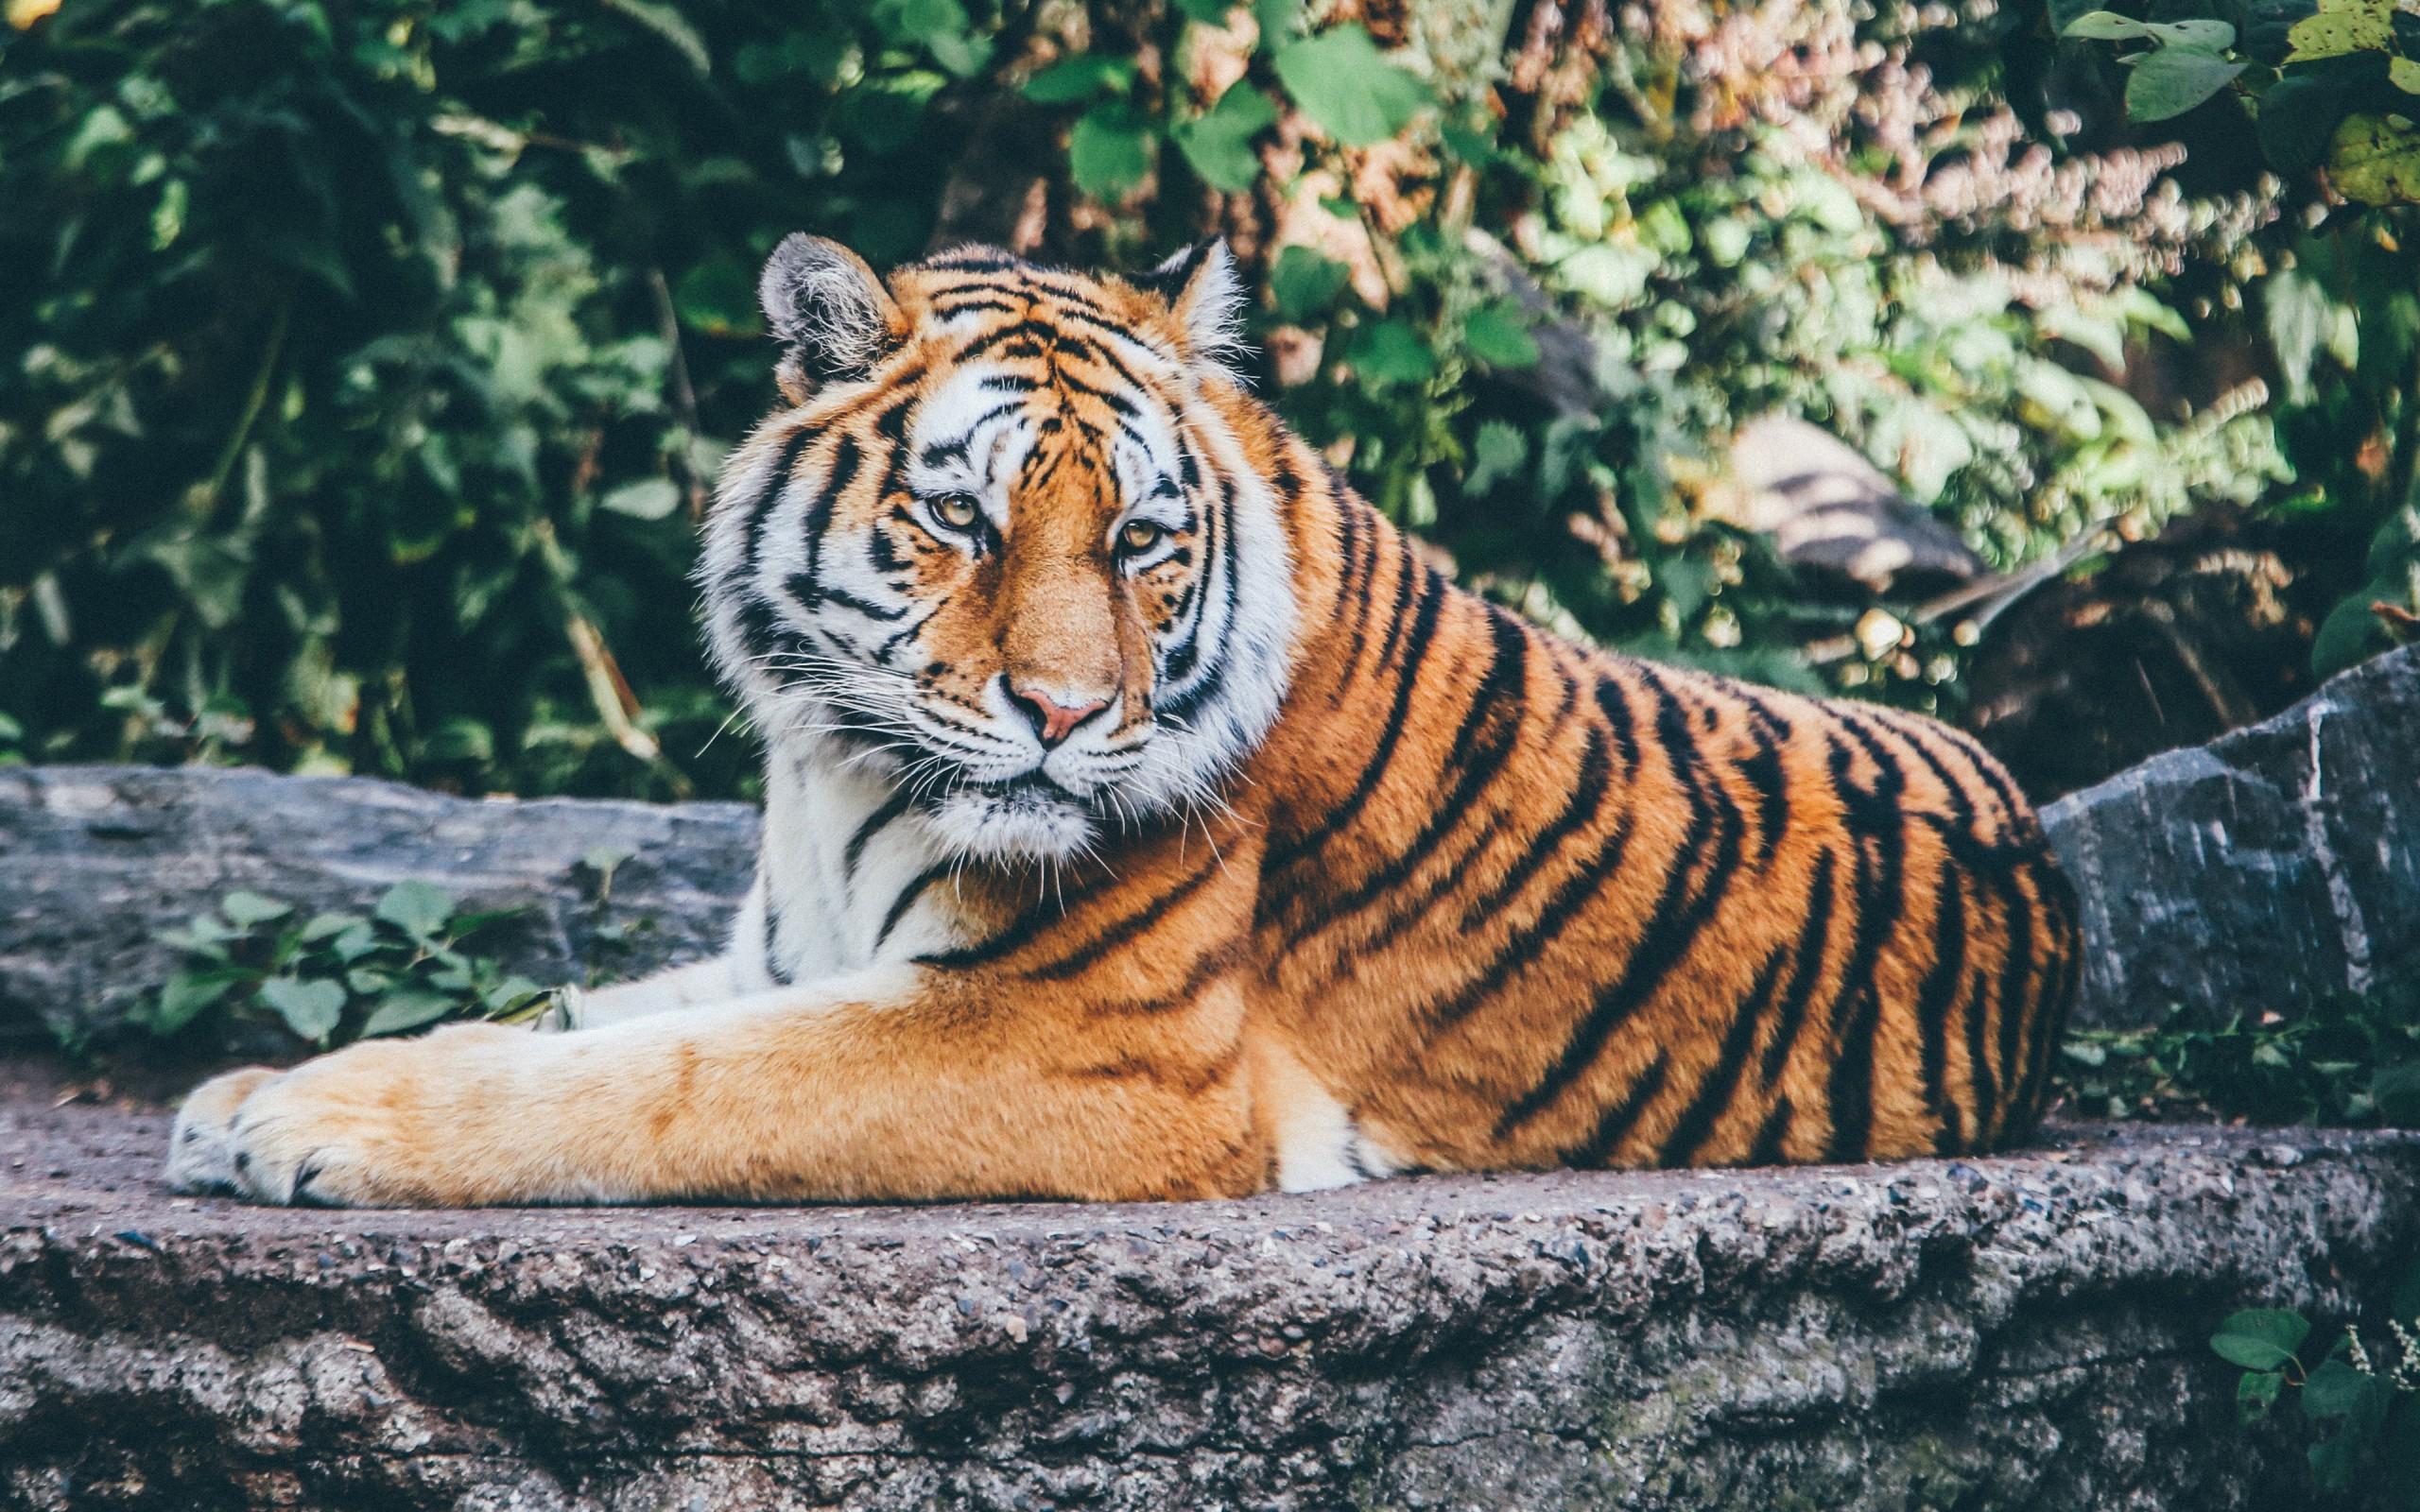 Download Beautiful Zoo Tiger Wallpaper In Hd 13 Retina Macbook Pro